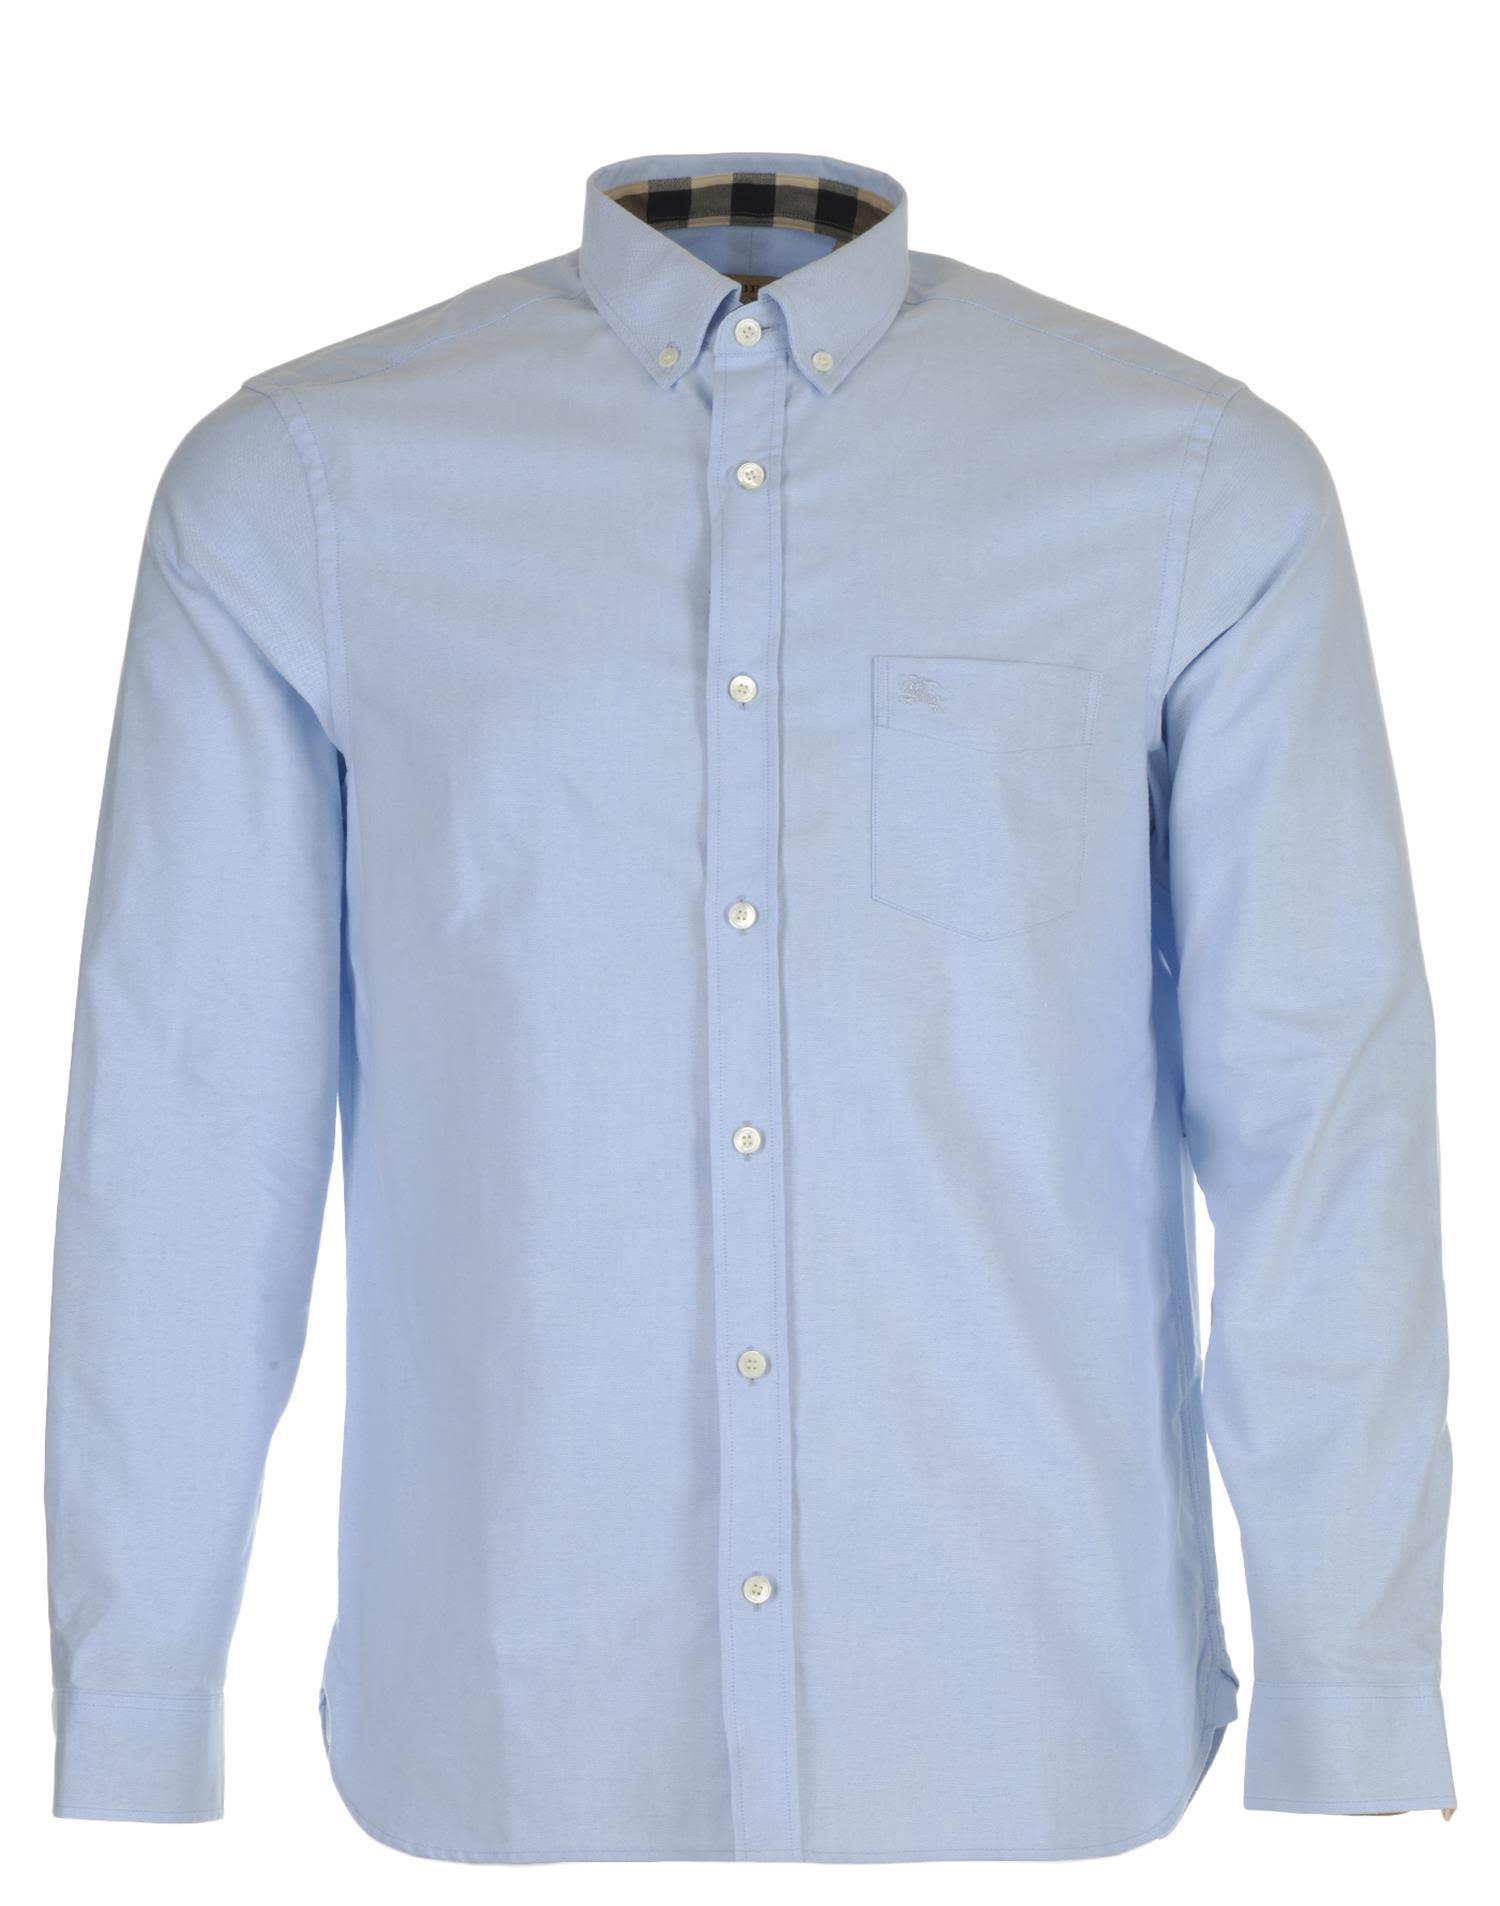 Burberry Reagan Shirt